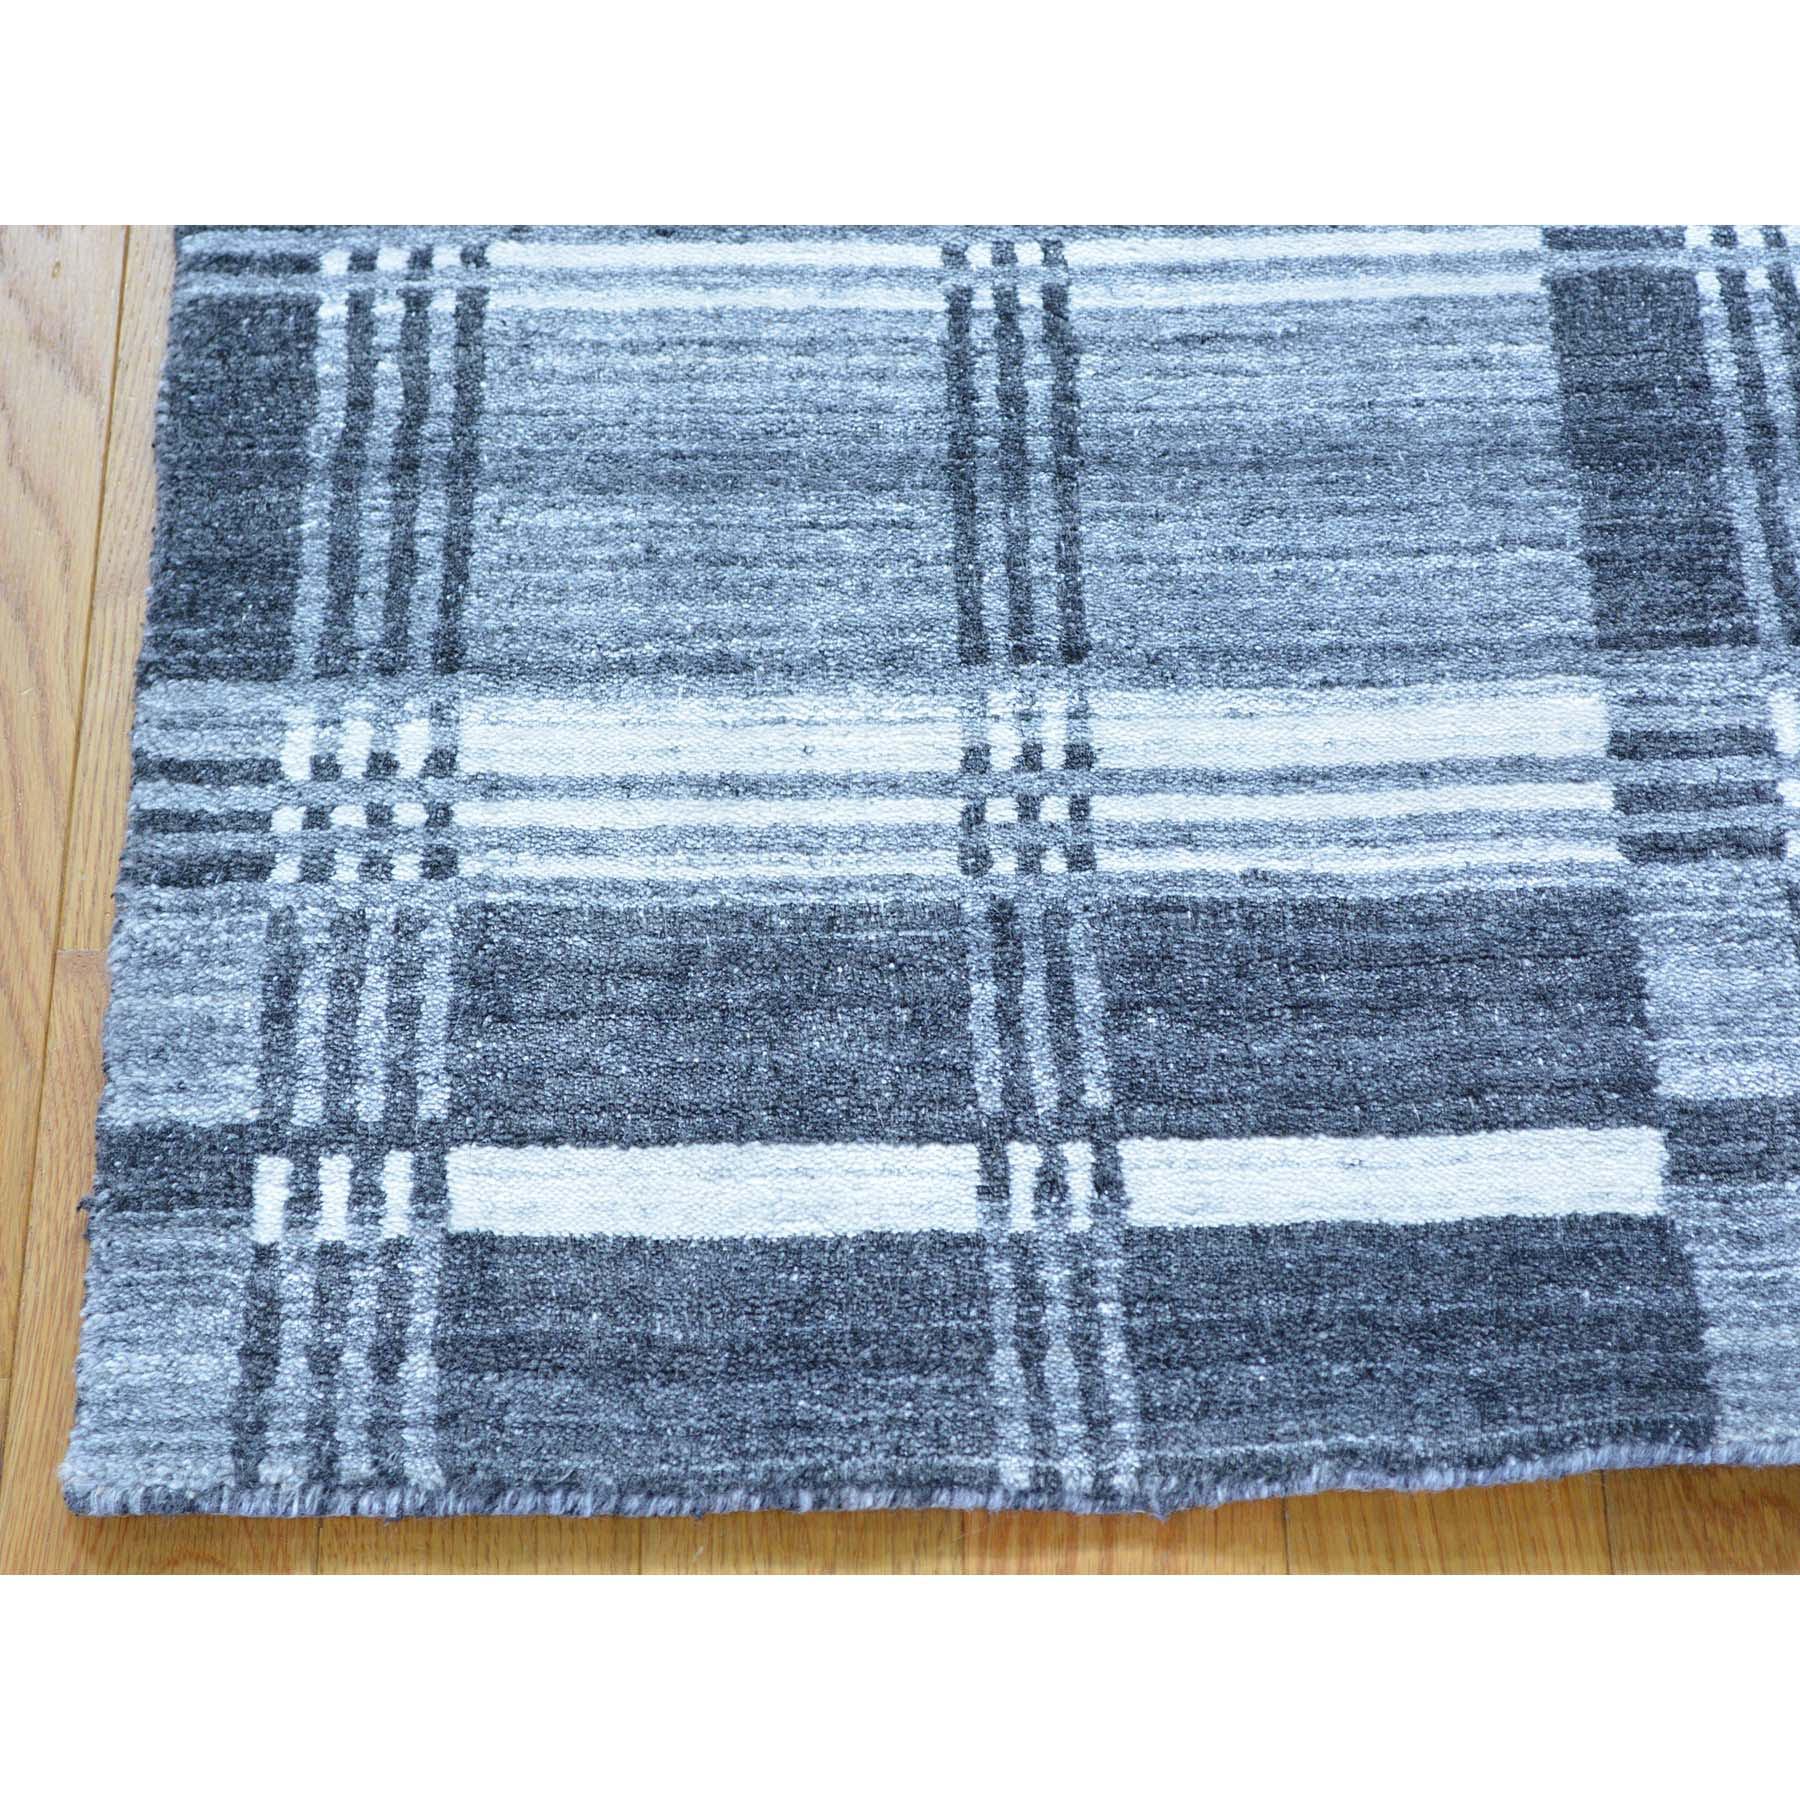 2- x 3- Geometric Design Handmade Modern 100 Percent Wool Oriental Rug